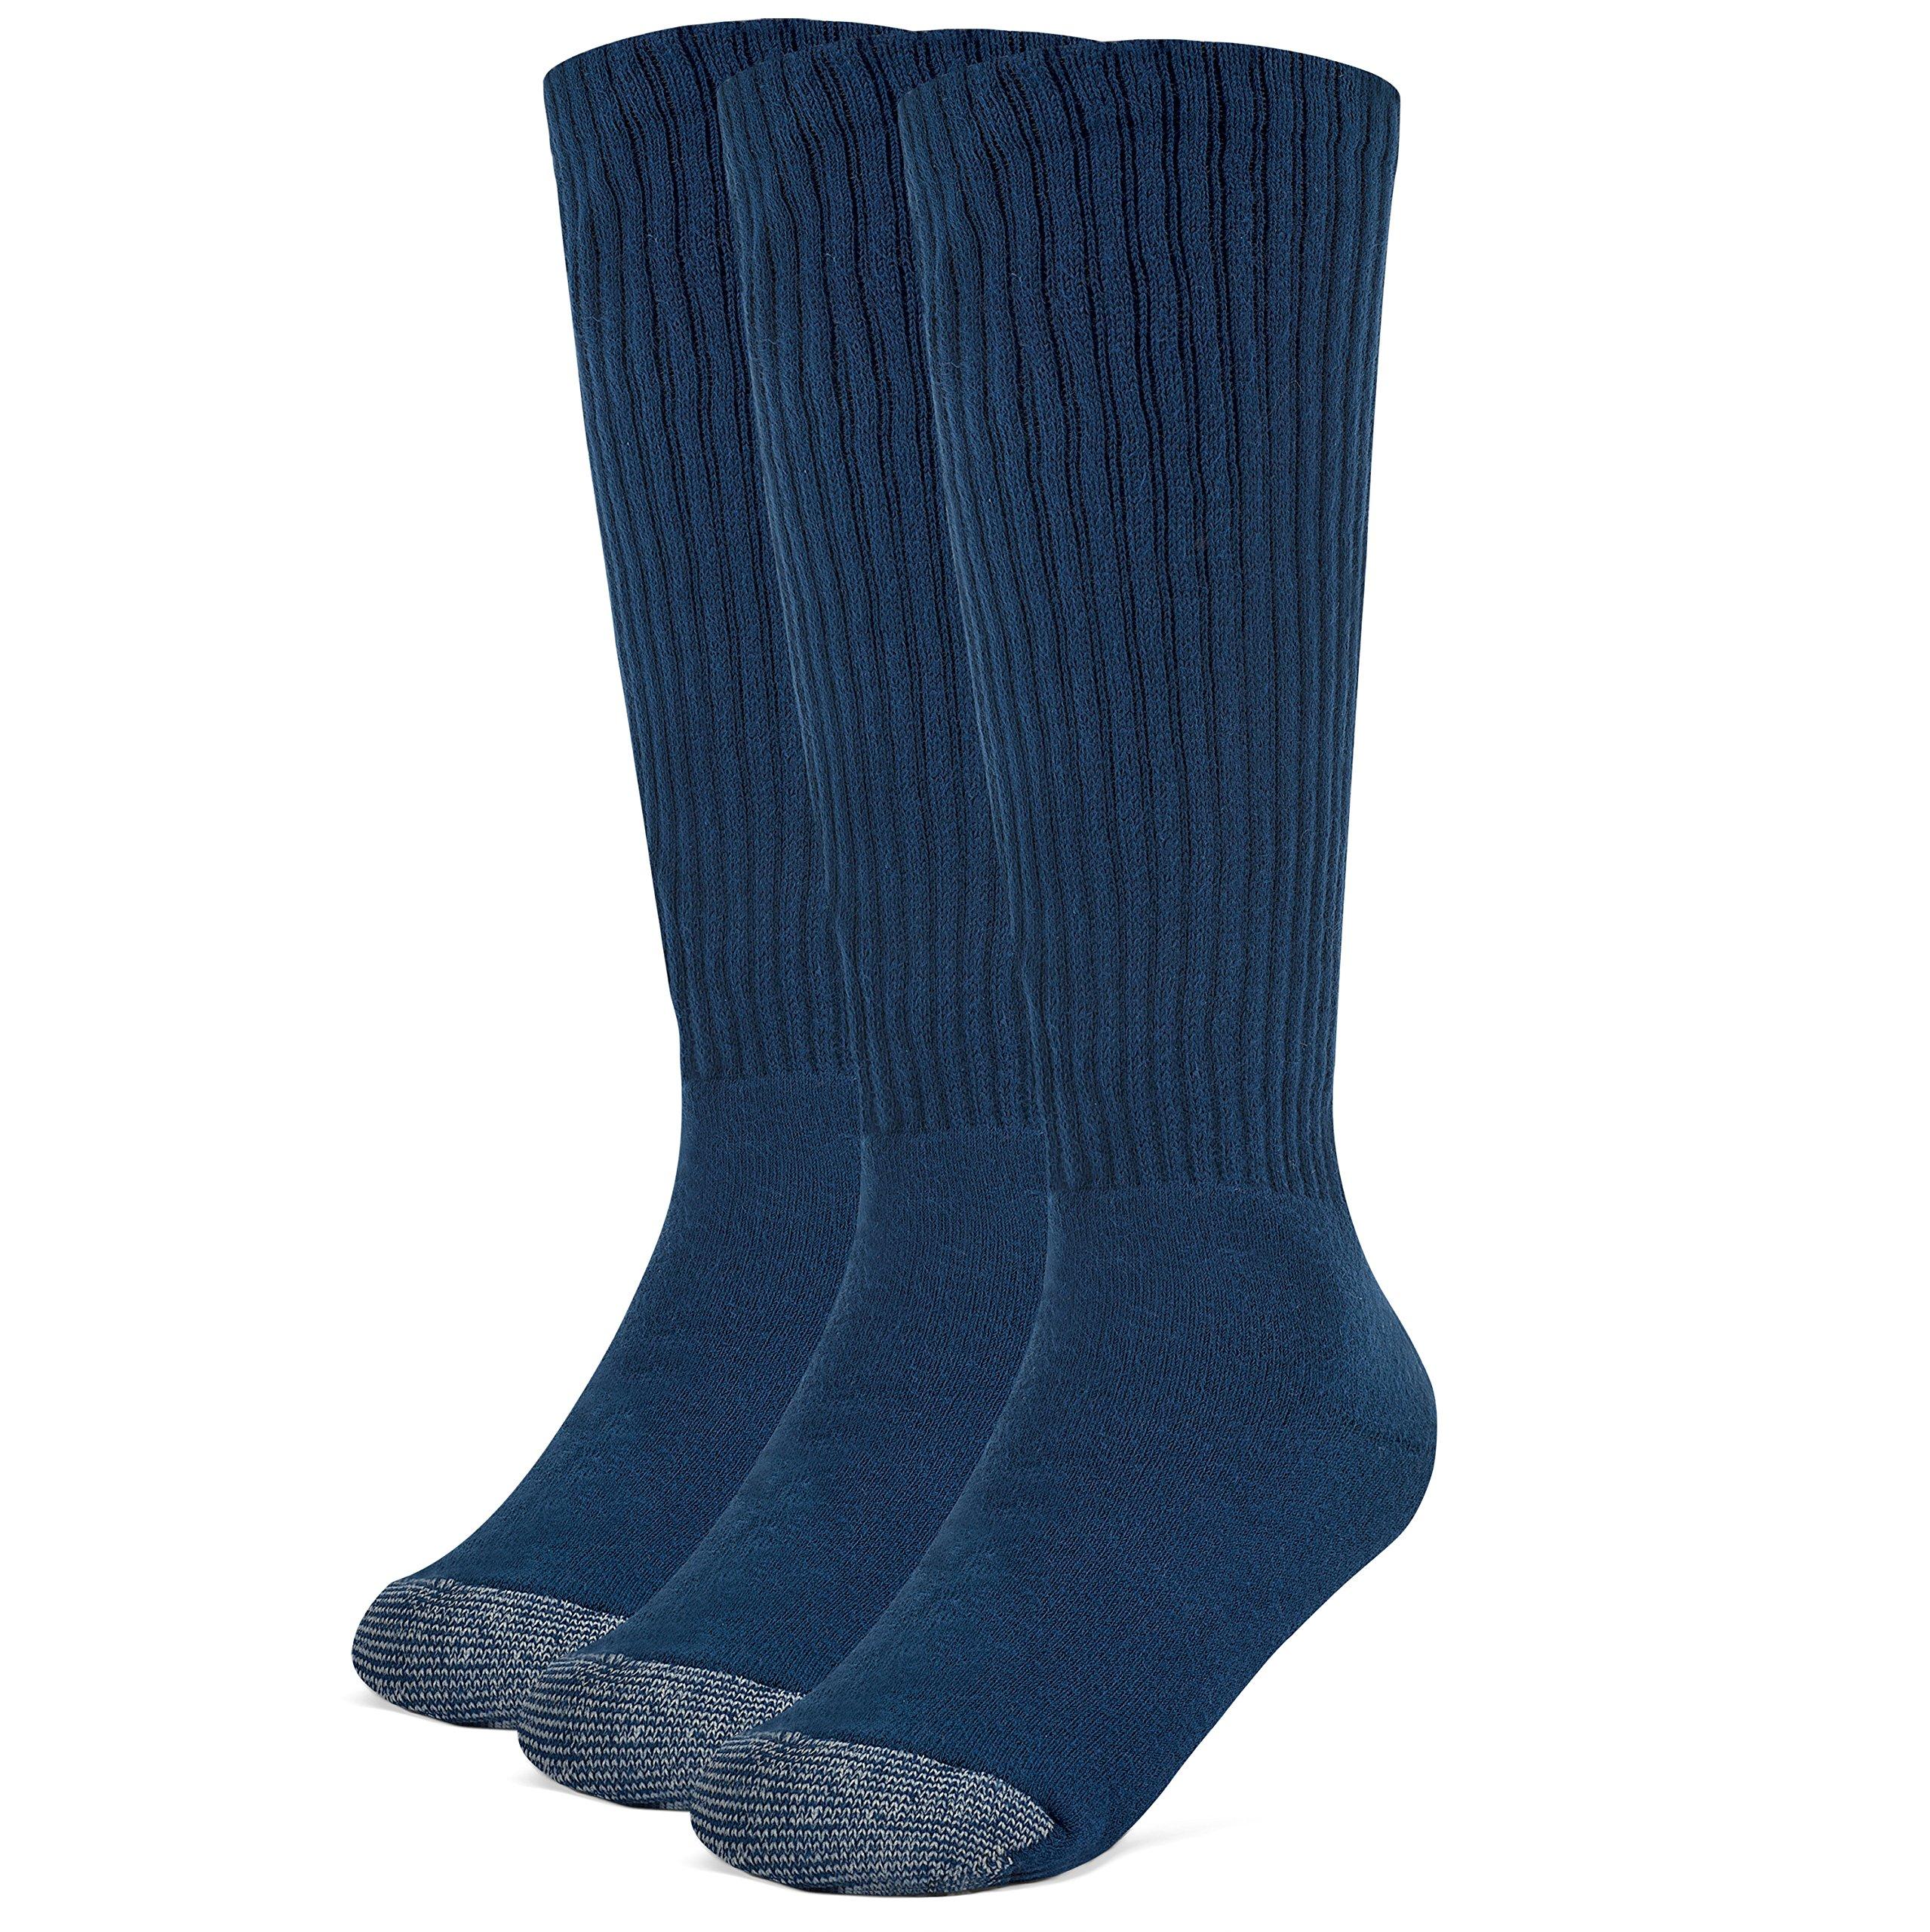 Galiva Boys' Cotton Extra Soft Over the Calf Cushion Socks - 3 Pairs, Small, Navy Blue